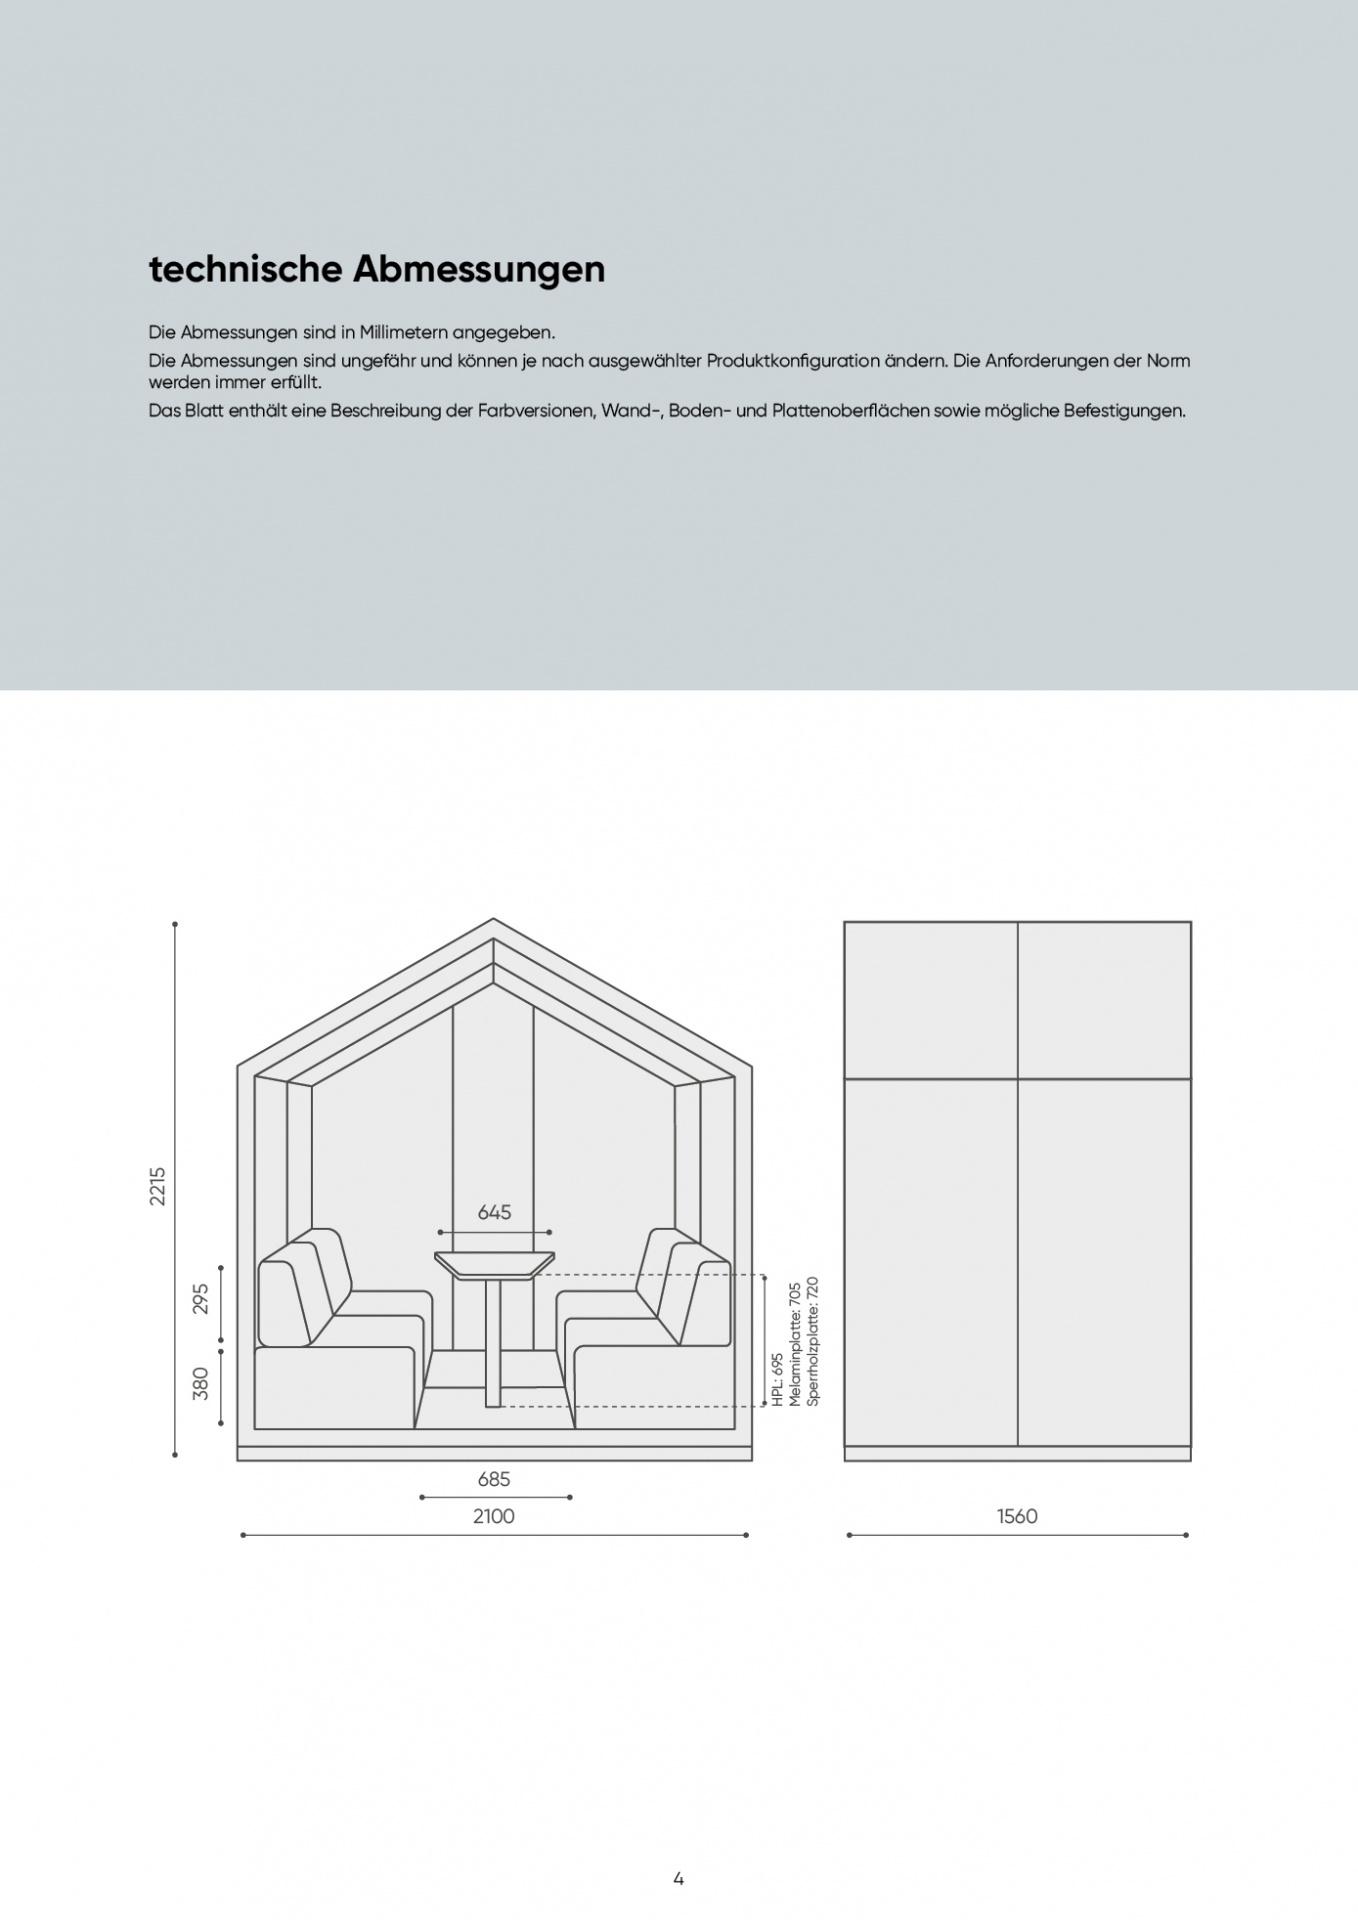 treehouse-akustik-moebel-4-person4.jpg